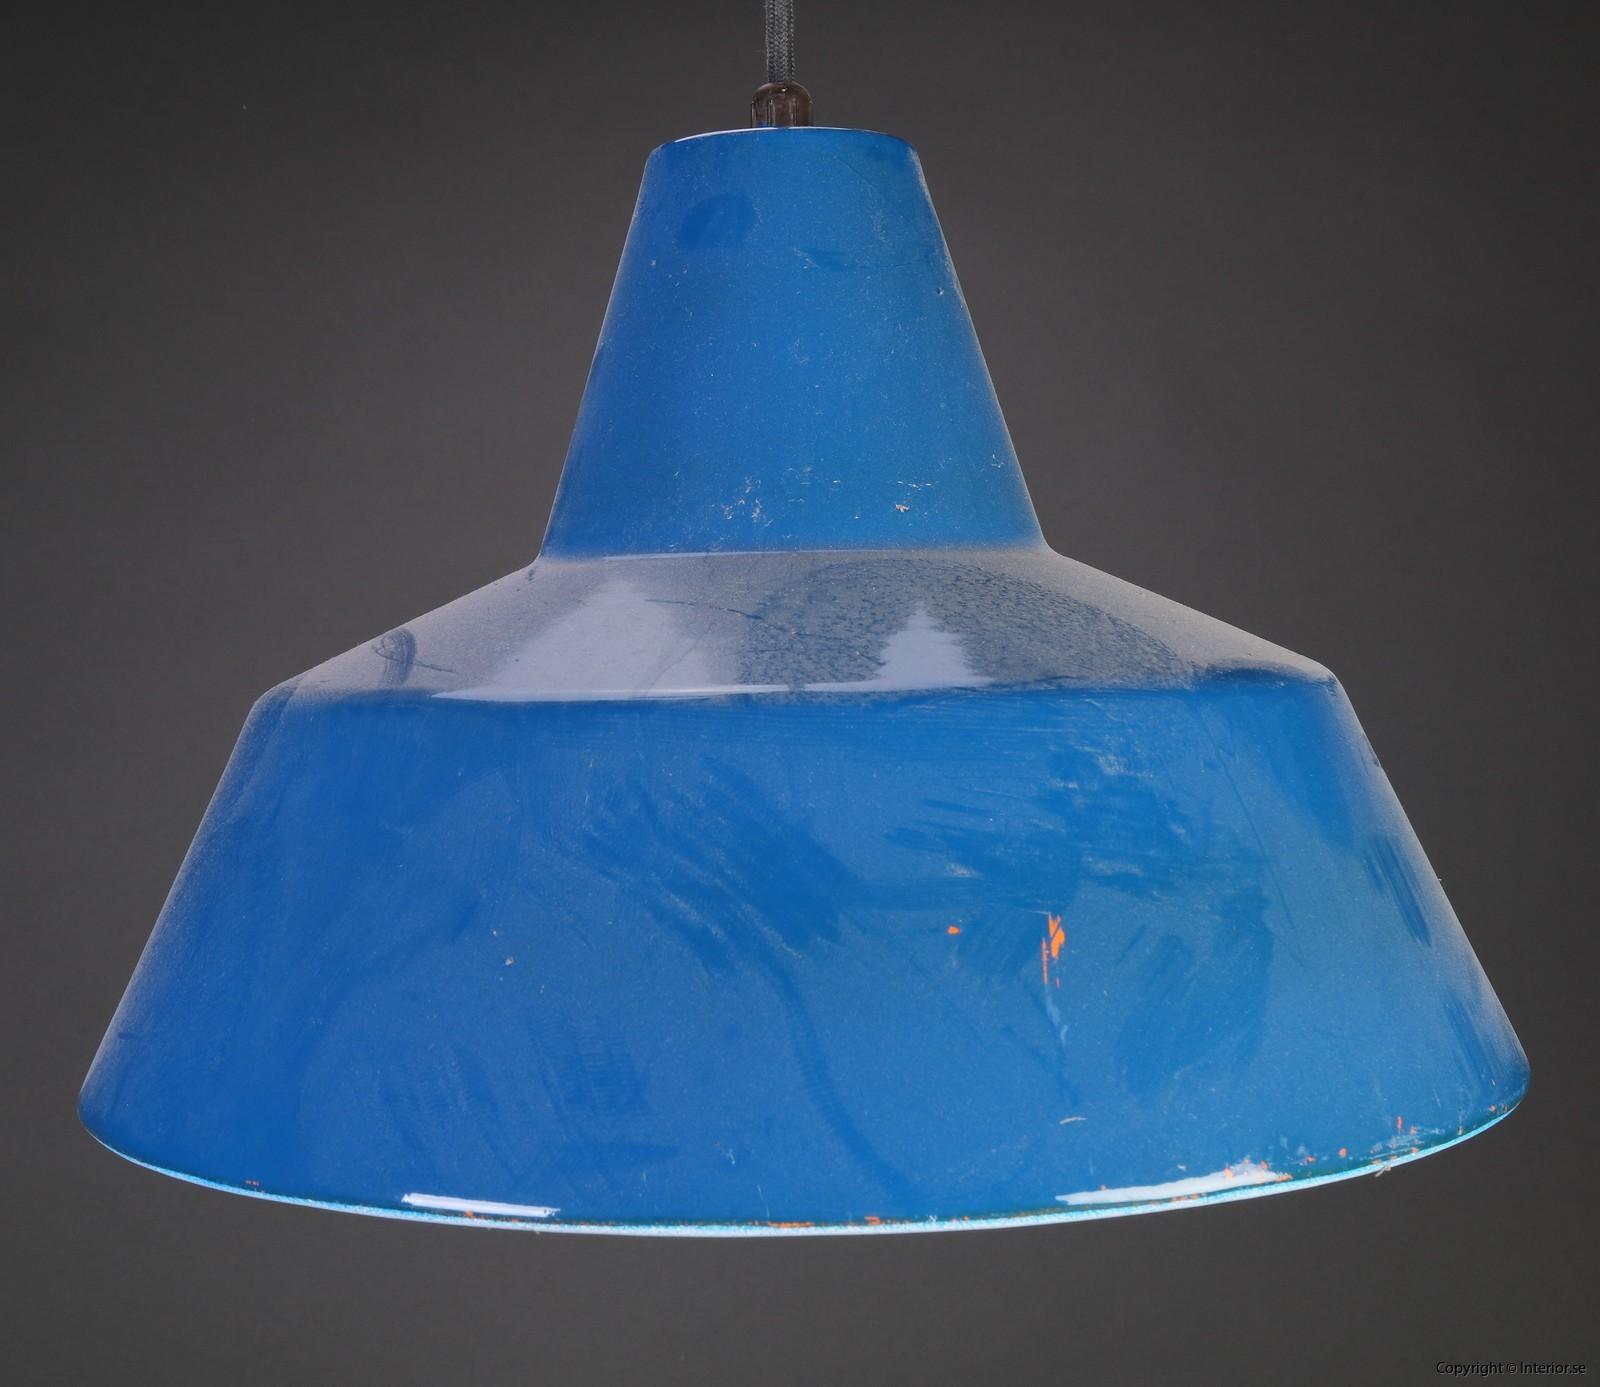 Louis Poulsen Industri lampor - Blå Industri industry design 4